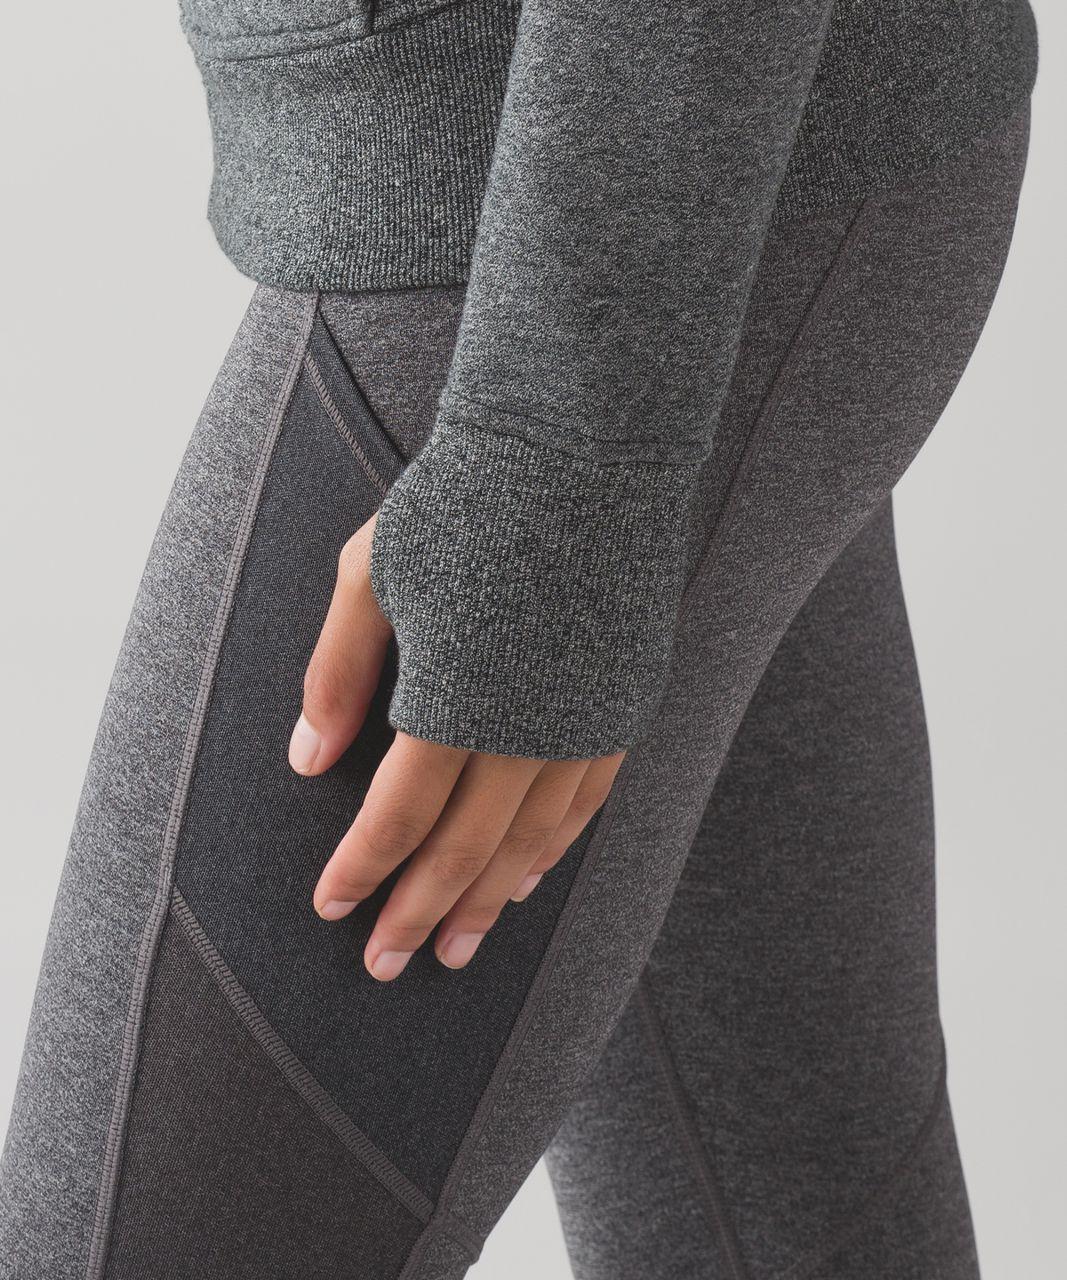 Lululemon Scuba Hoodie *Light Cotton Fleece - Heathered Speckled Black (First Release)